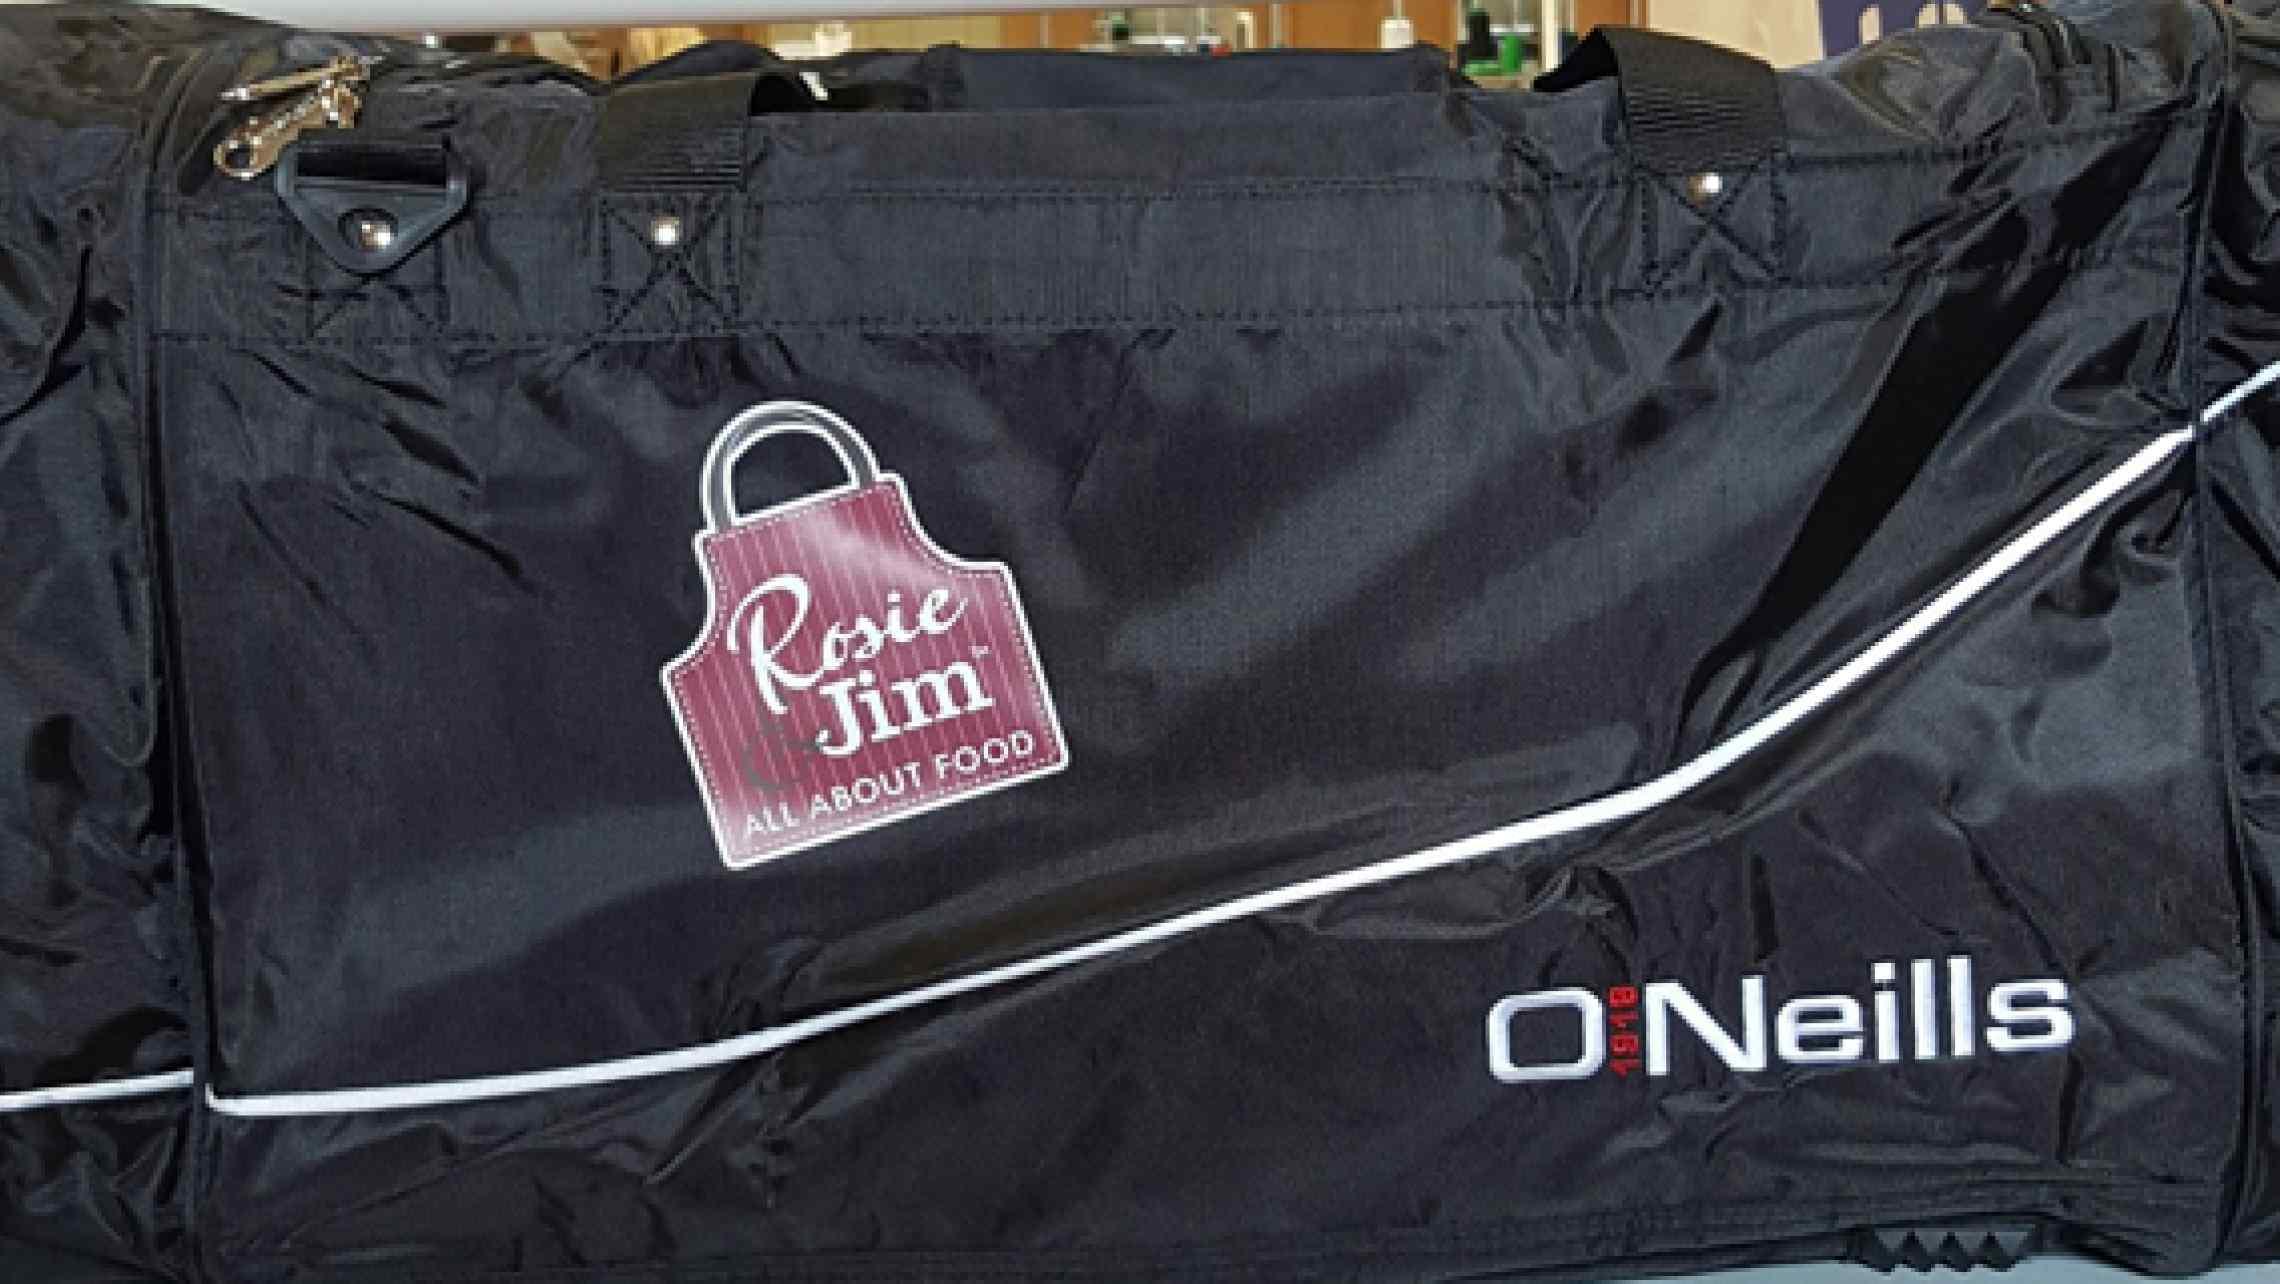 Rosie & Jim sponsor O'Neills Gear Bags for Courtwood GAA ...